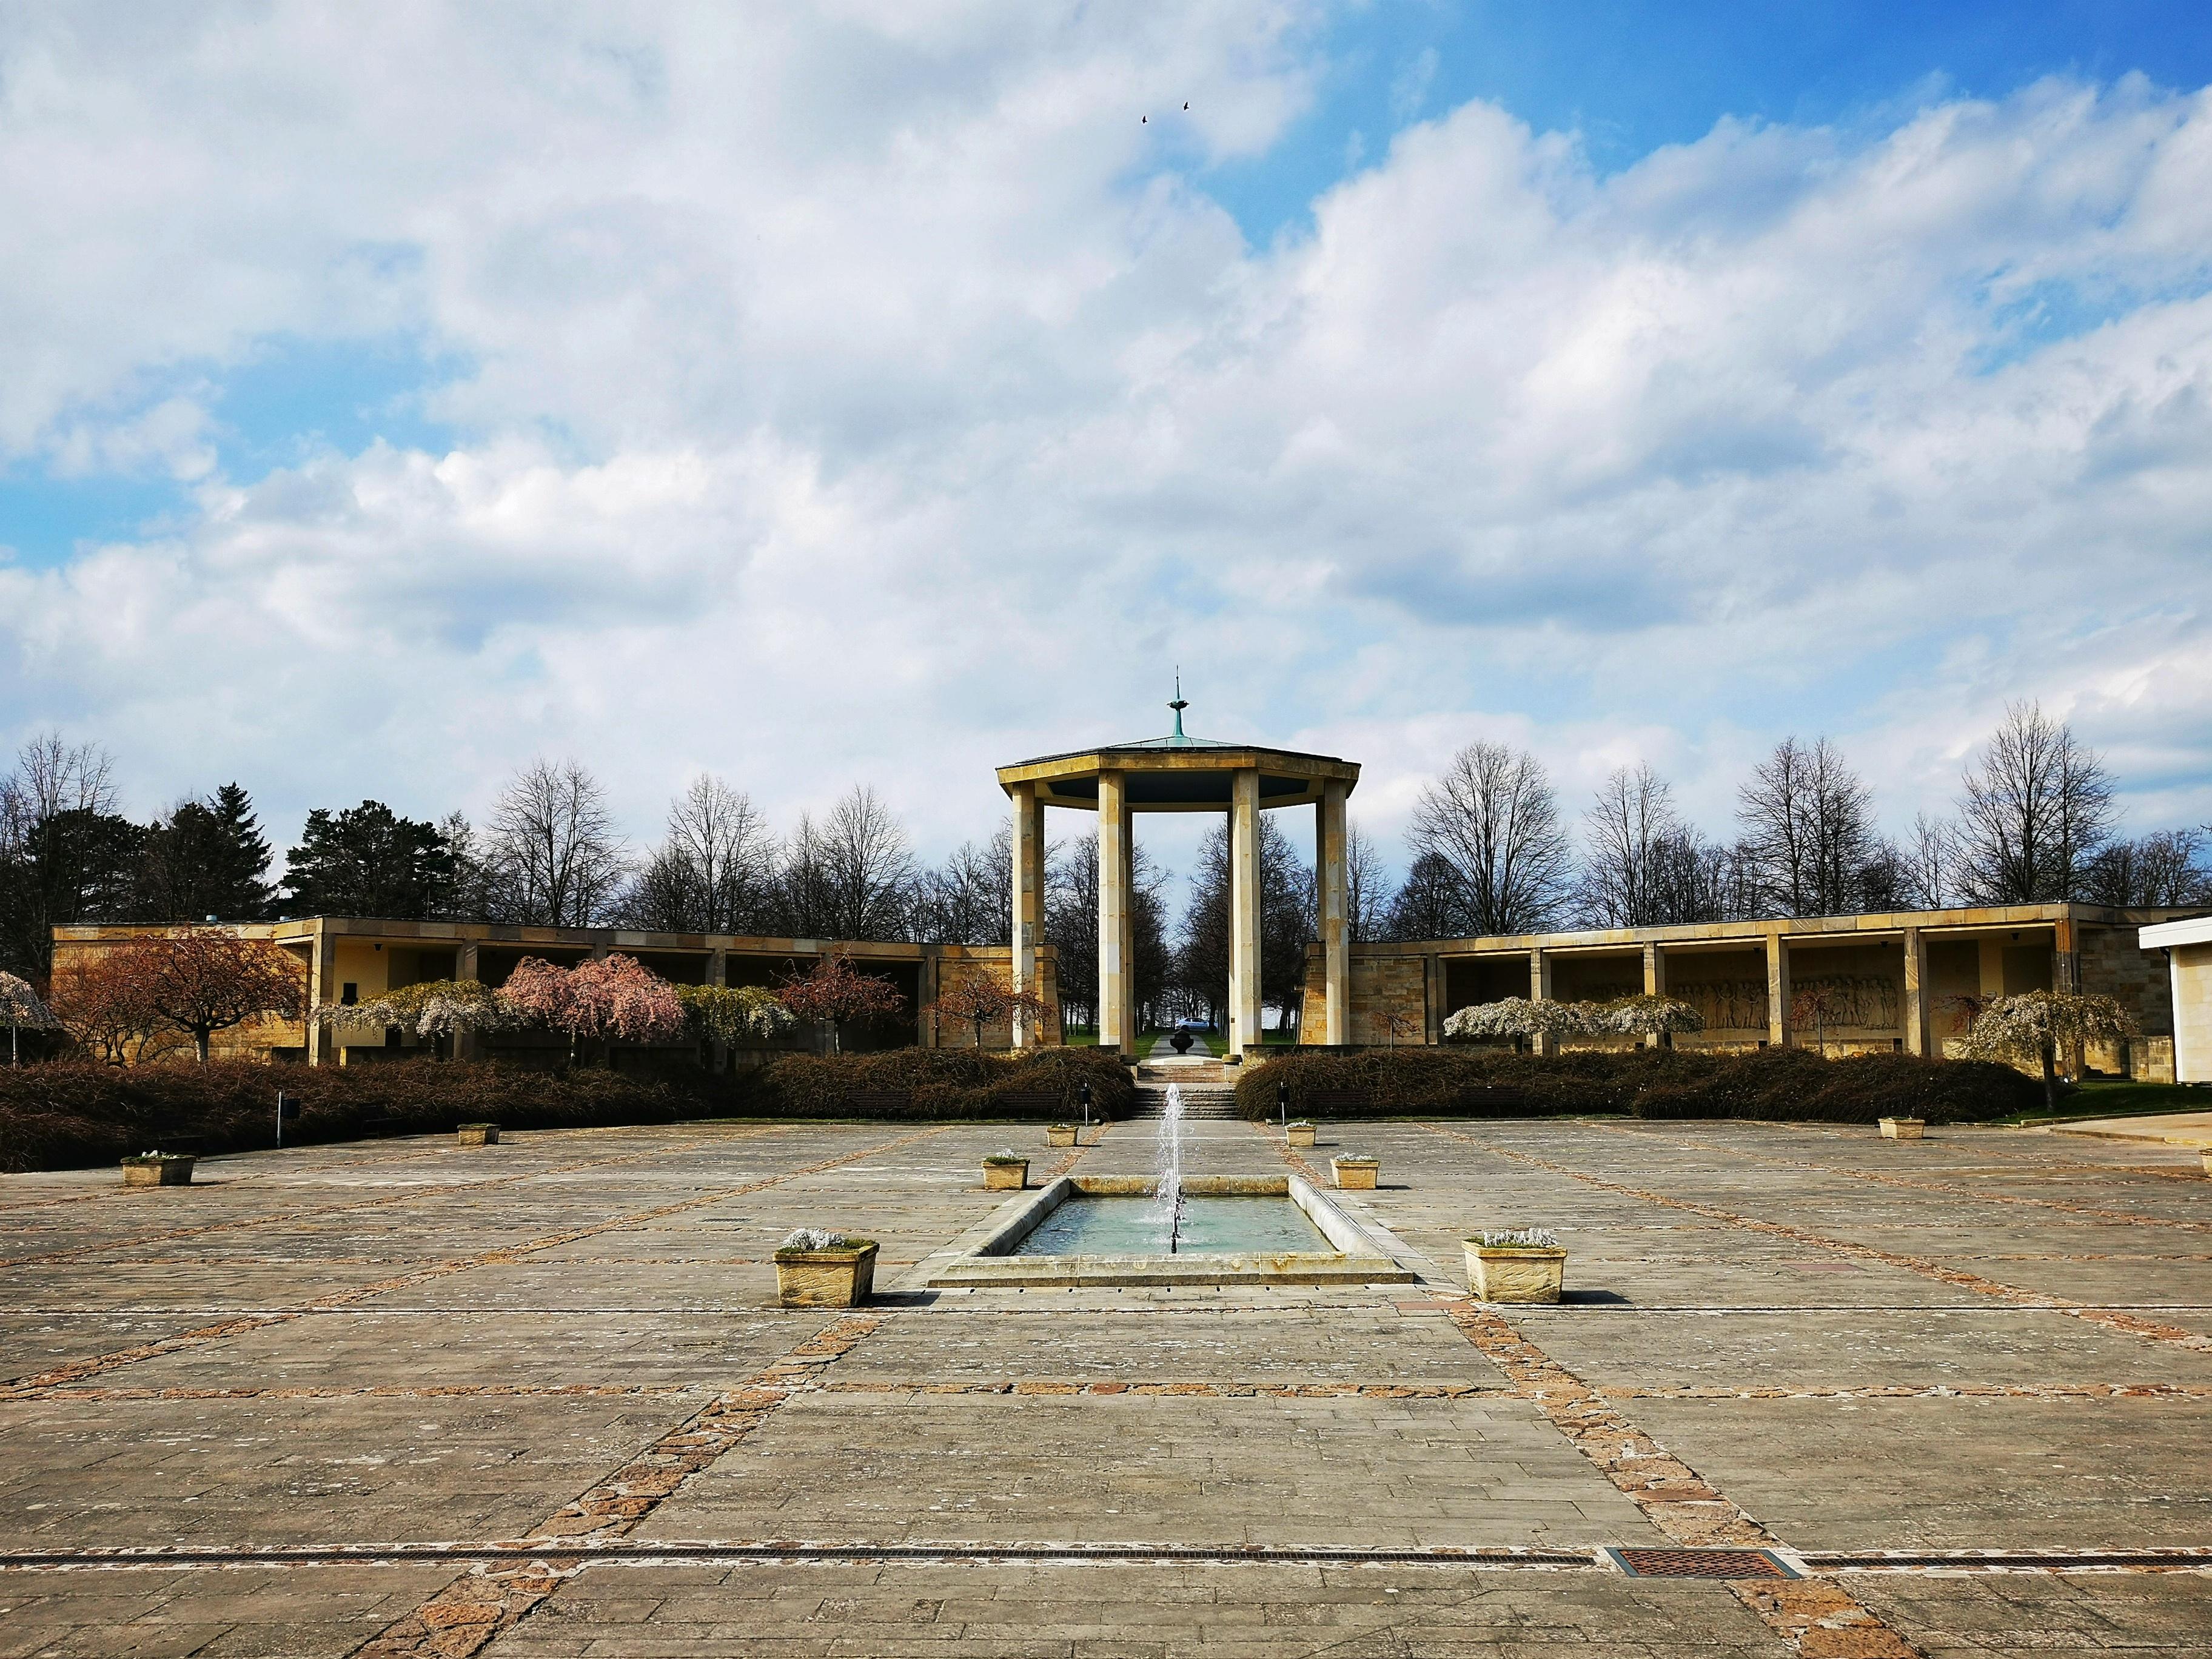 Gloriet at Lidice Memorial, designed by František Marek.